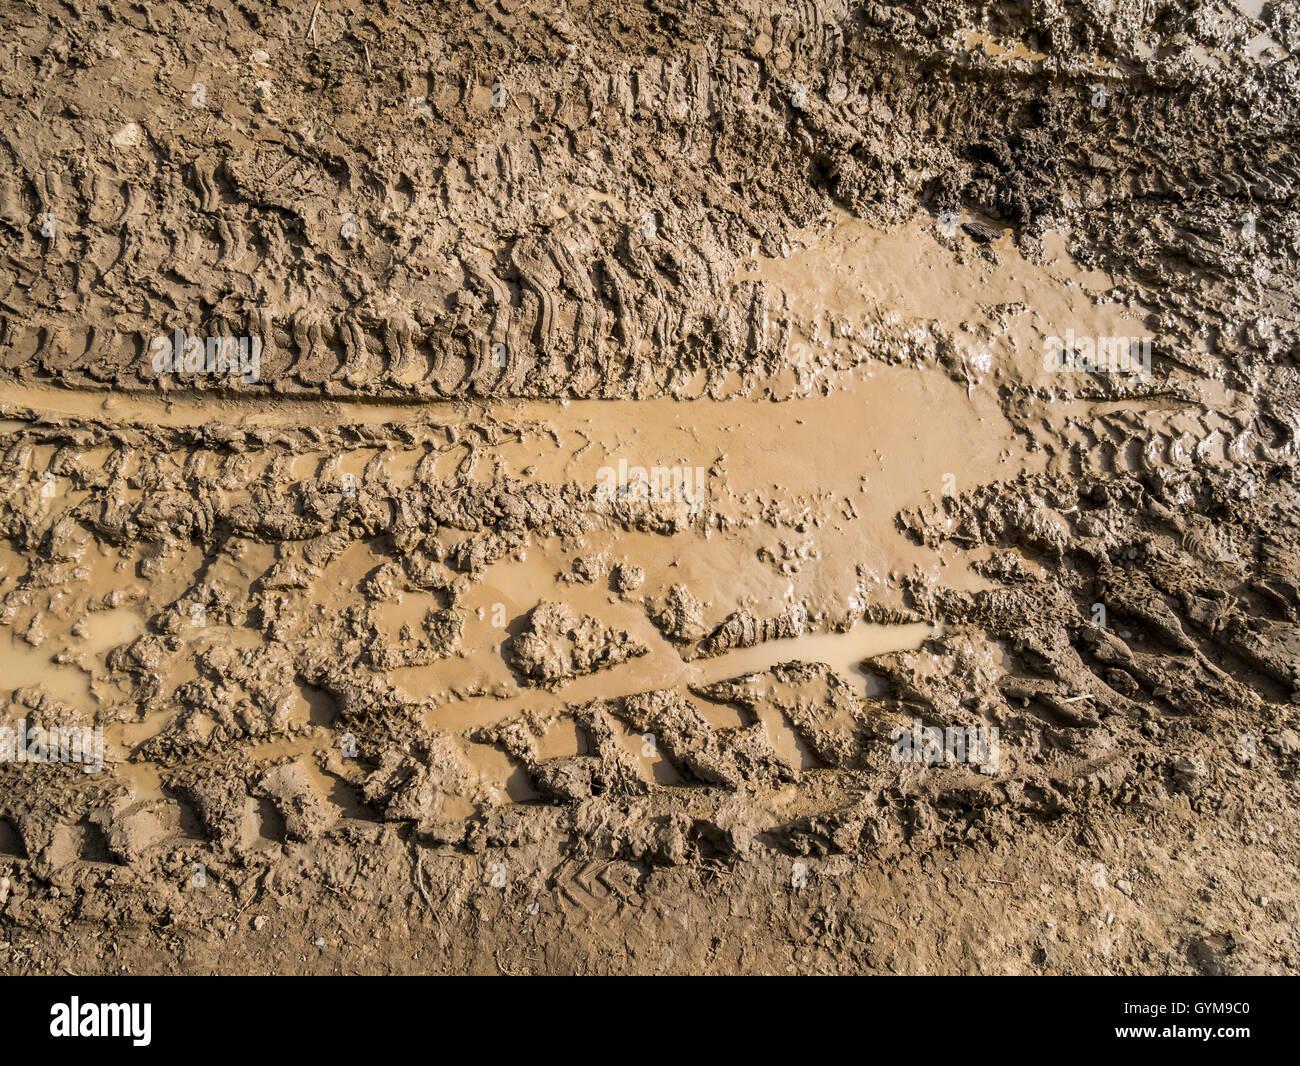 Car tracks in mud - Stock Image